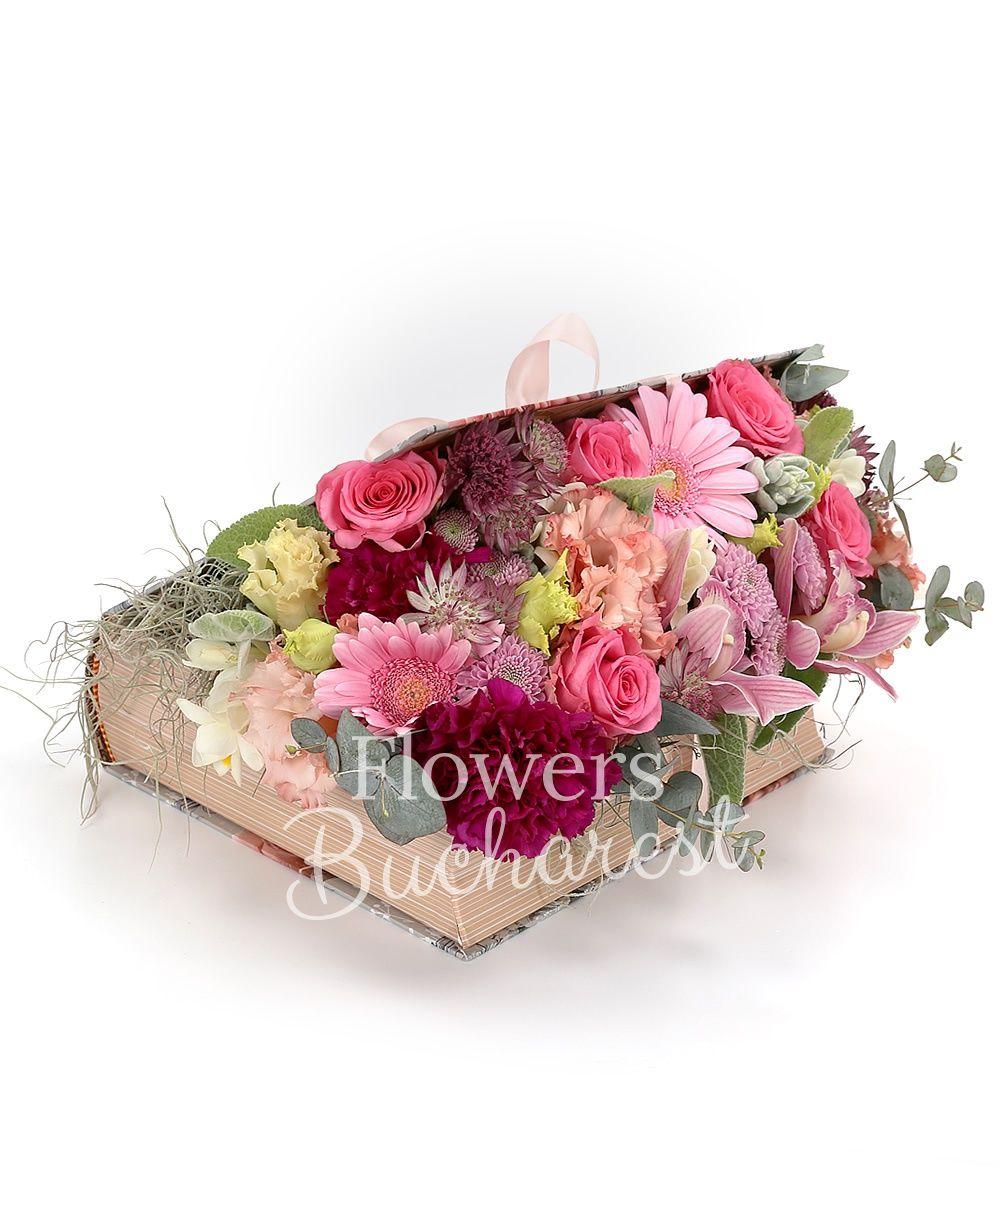 3 cappuccino roses, 2 pink gerbera, 5 white freesias, 3 cyclam carnations, 2 pink santini, 2 pink lisianthus, pink cymbidium, astranția, greenery